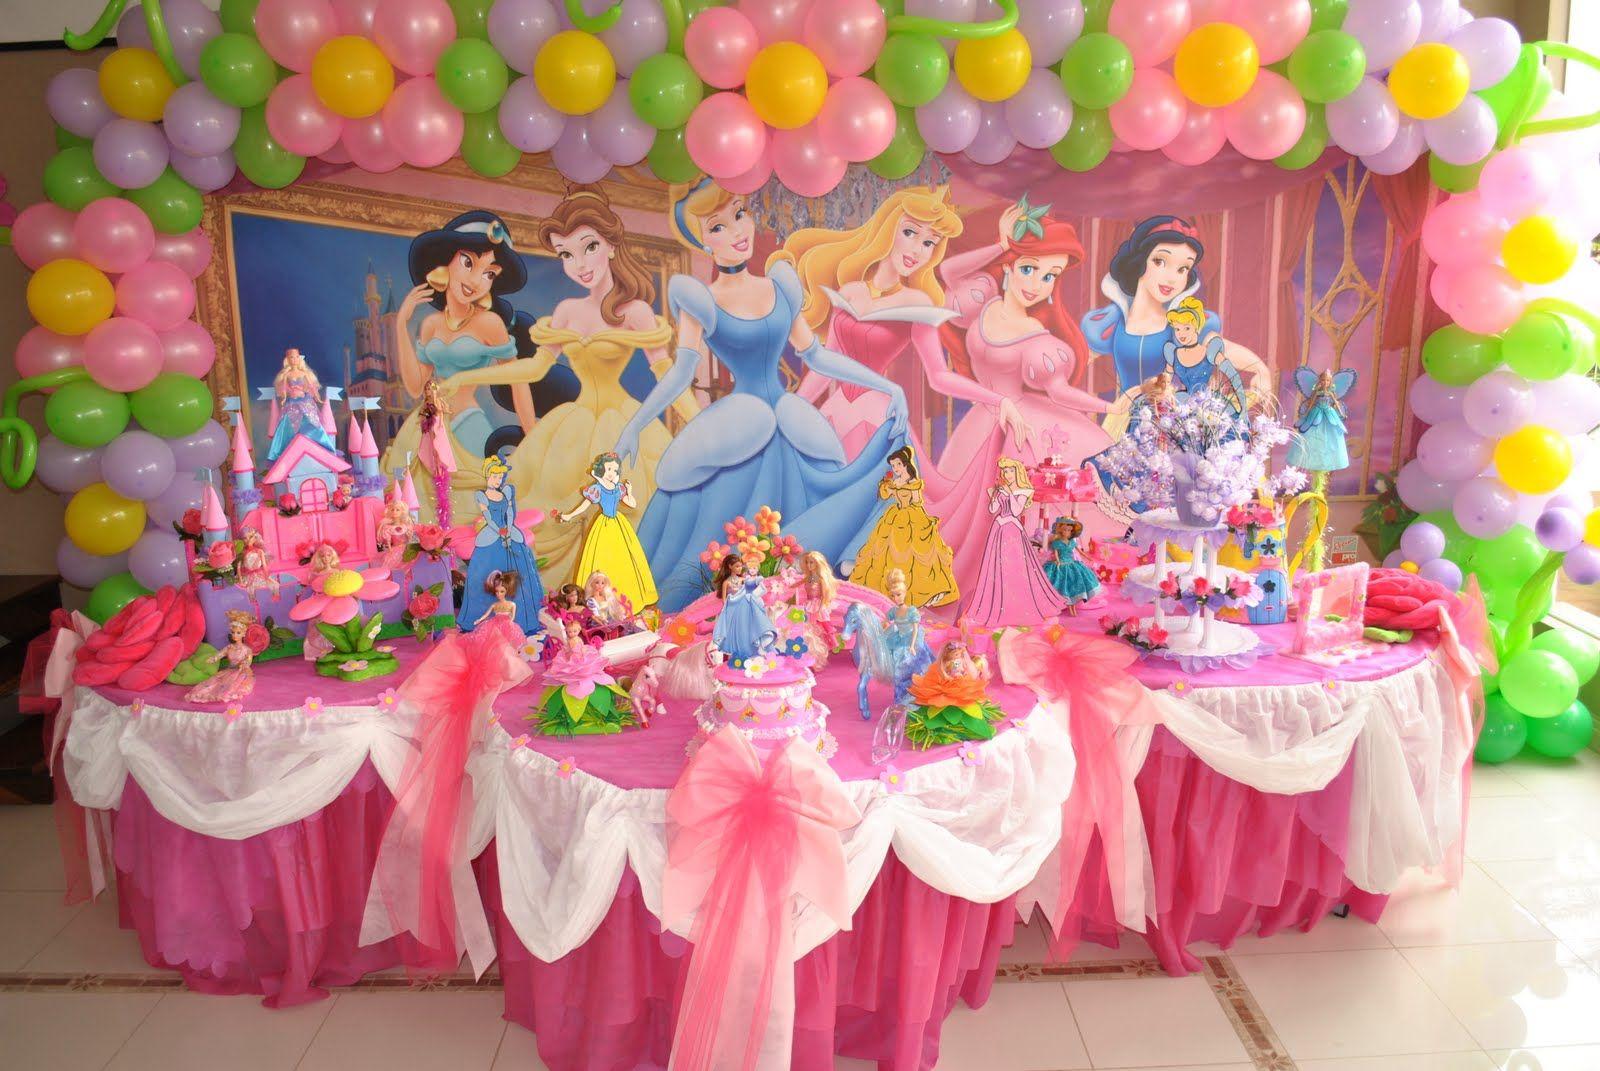 kids party disney princesses decor | Princess theme party, Disney princess theme party, Princess ...